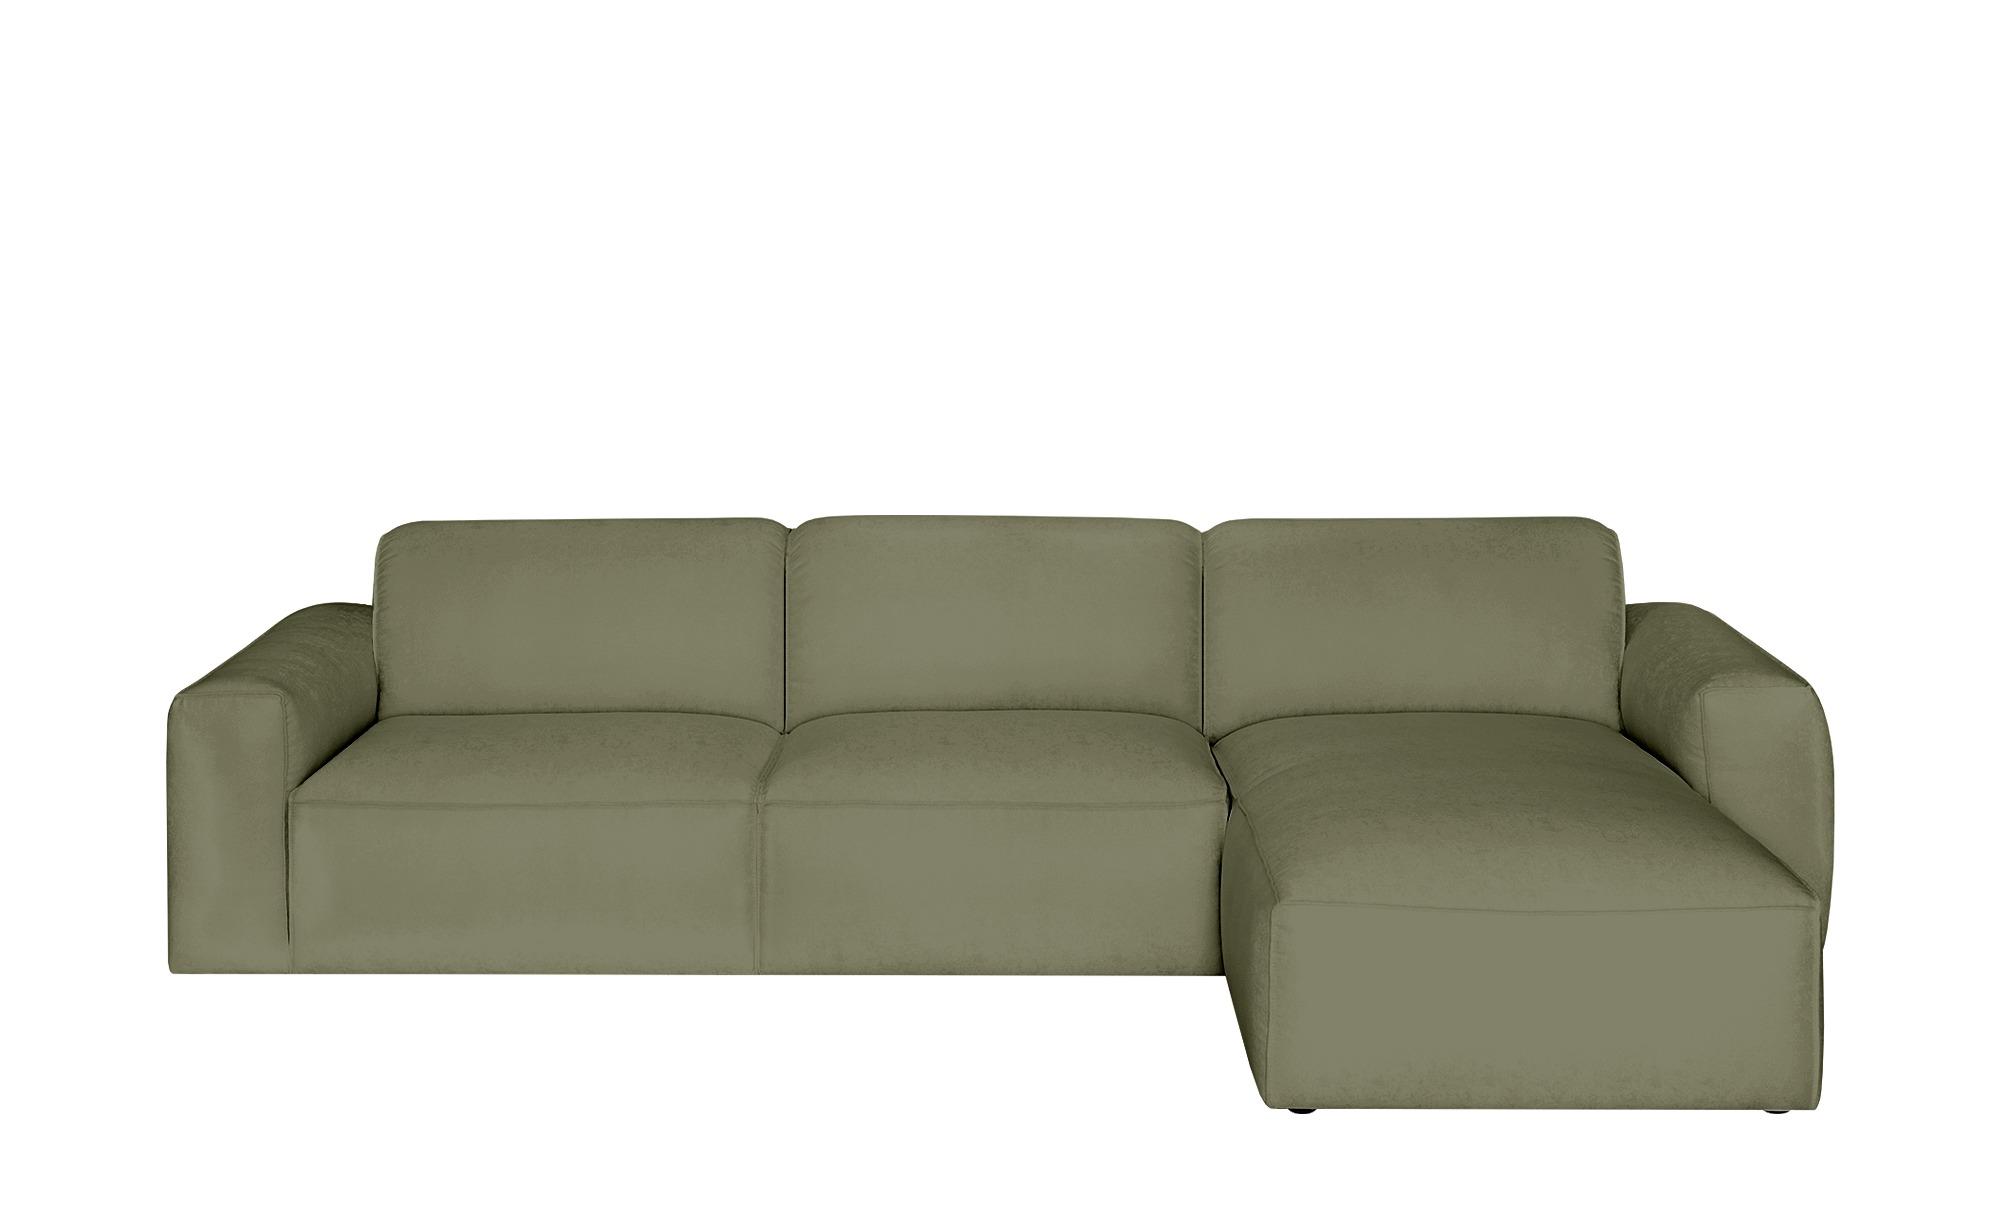 Gray & Jones Ecksofa  Factory ¦ grün ¦ Maße (cm): H: 75 T: 100 Polstermöbel > Sofas > Ecksofas - Höffner